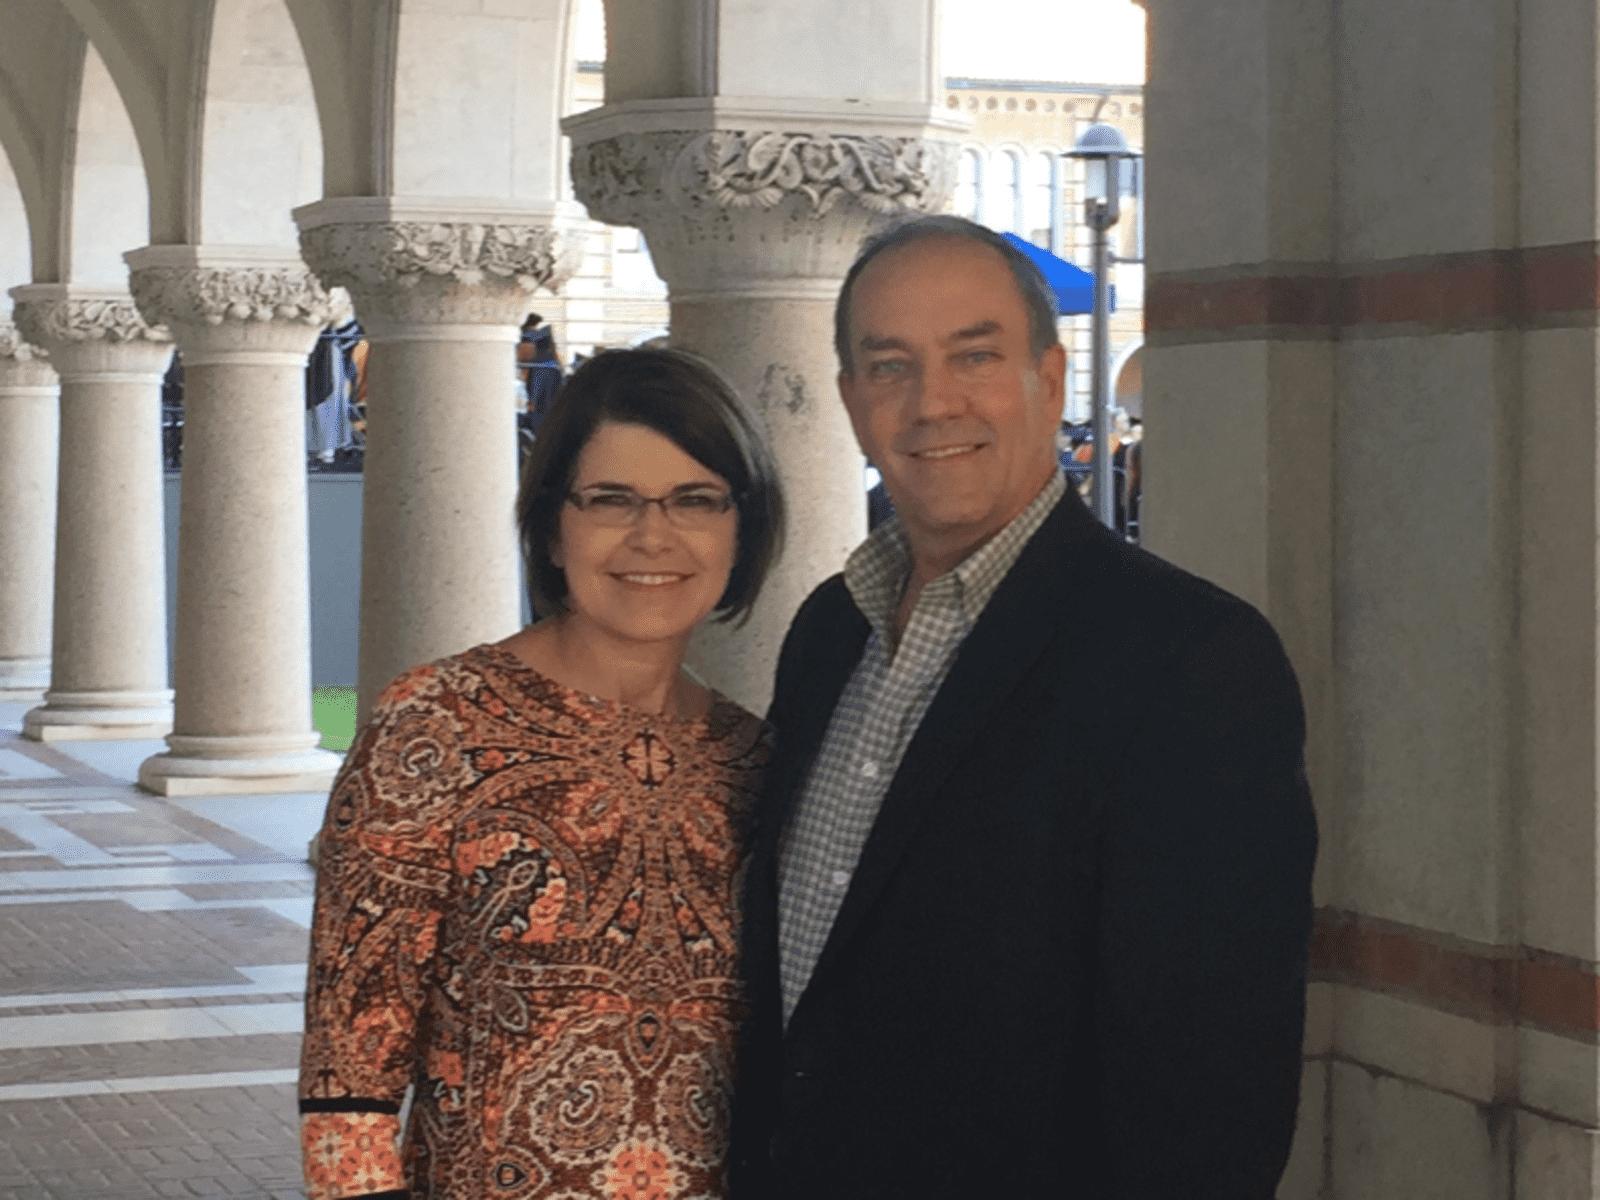 Tom & Lisa from Denton, Texas, United States